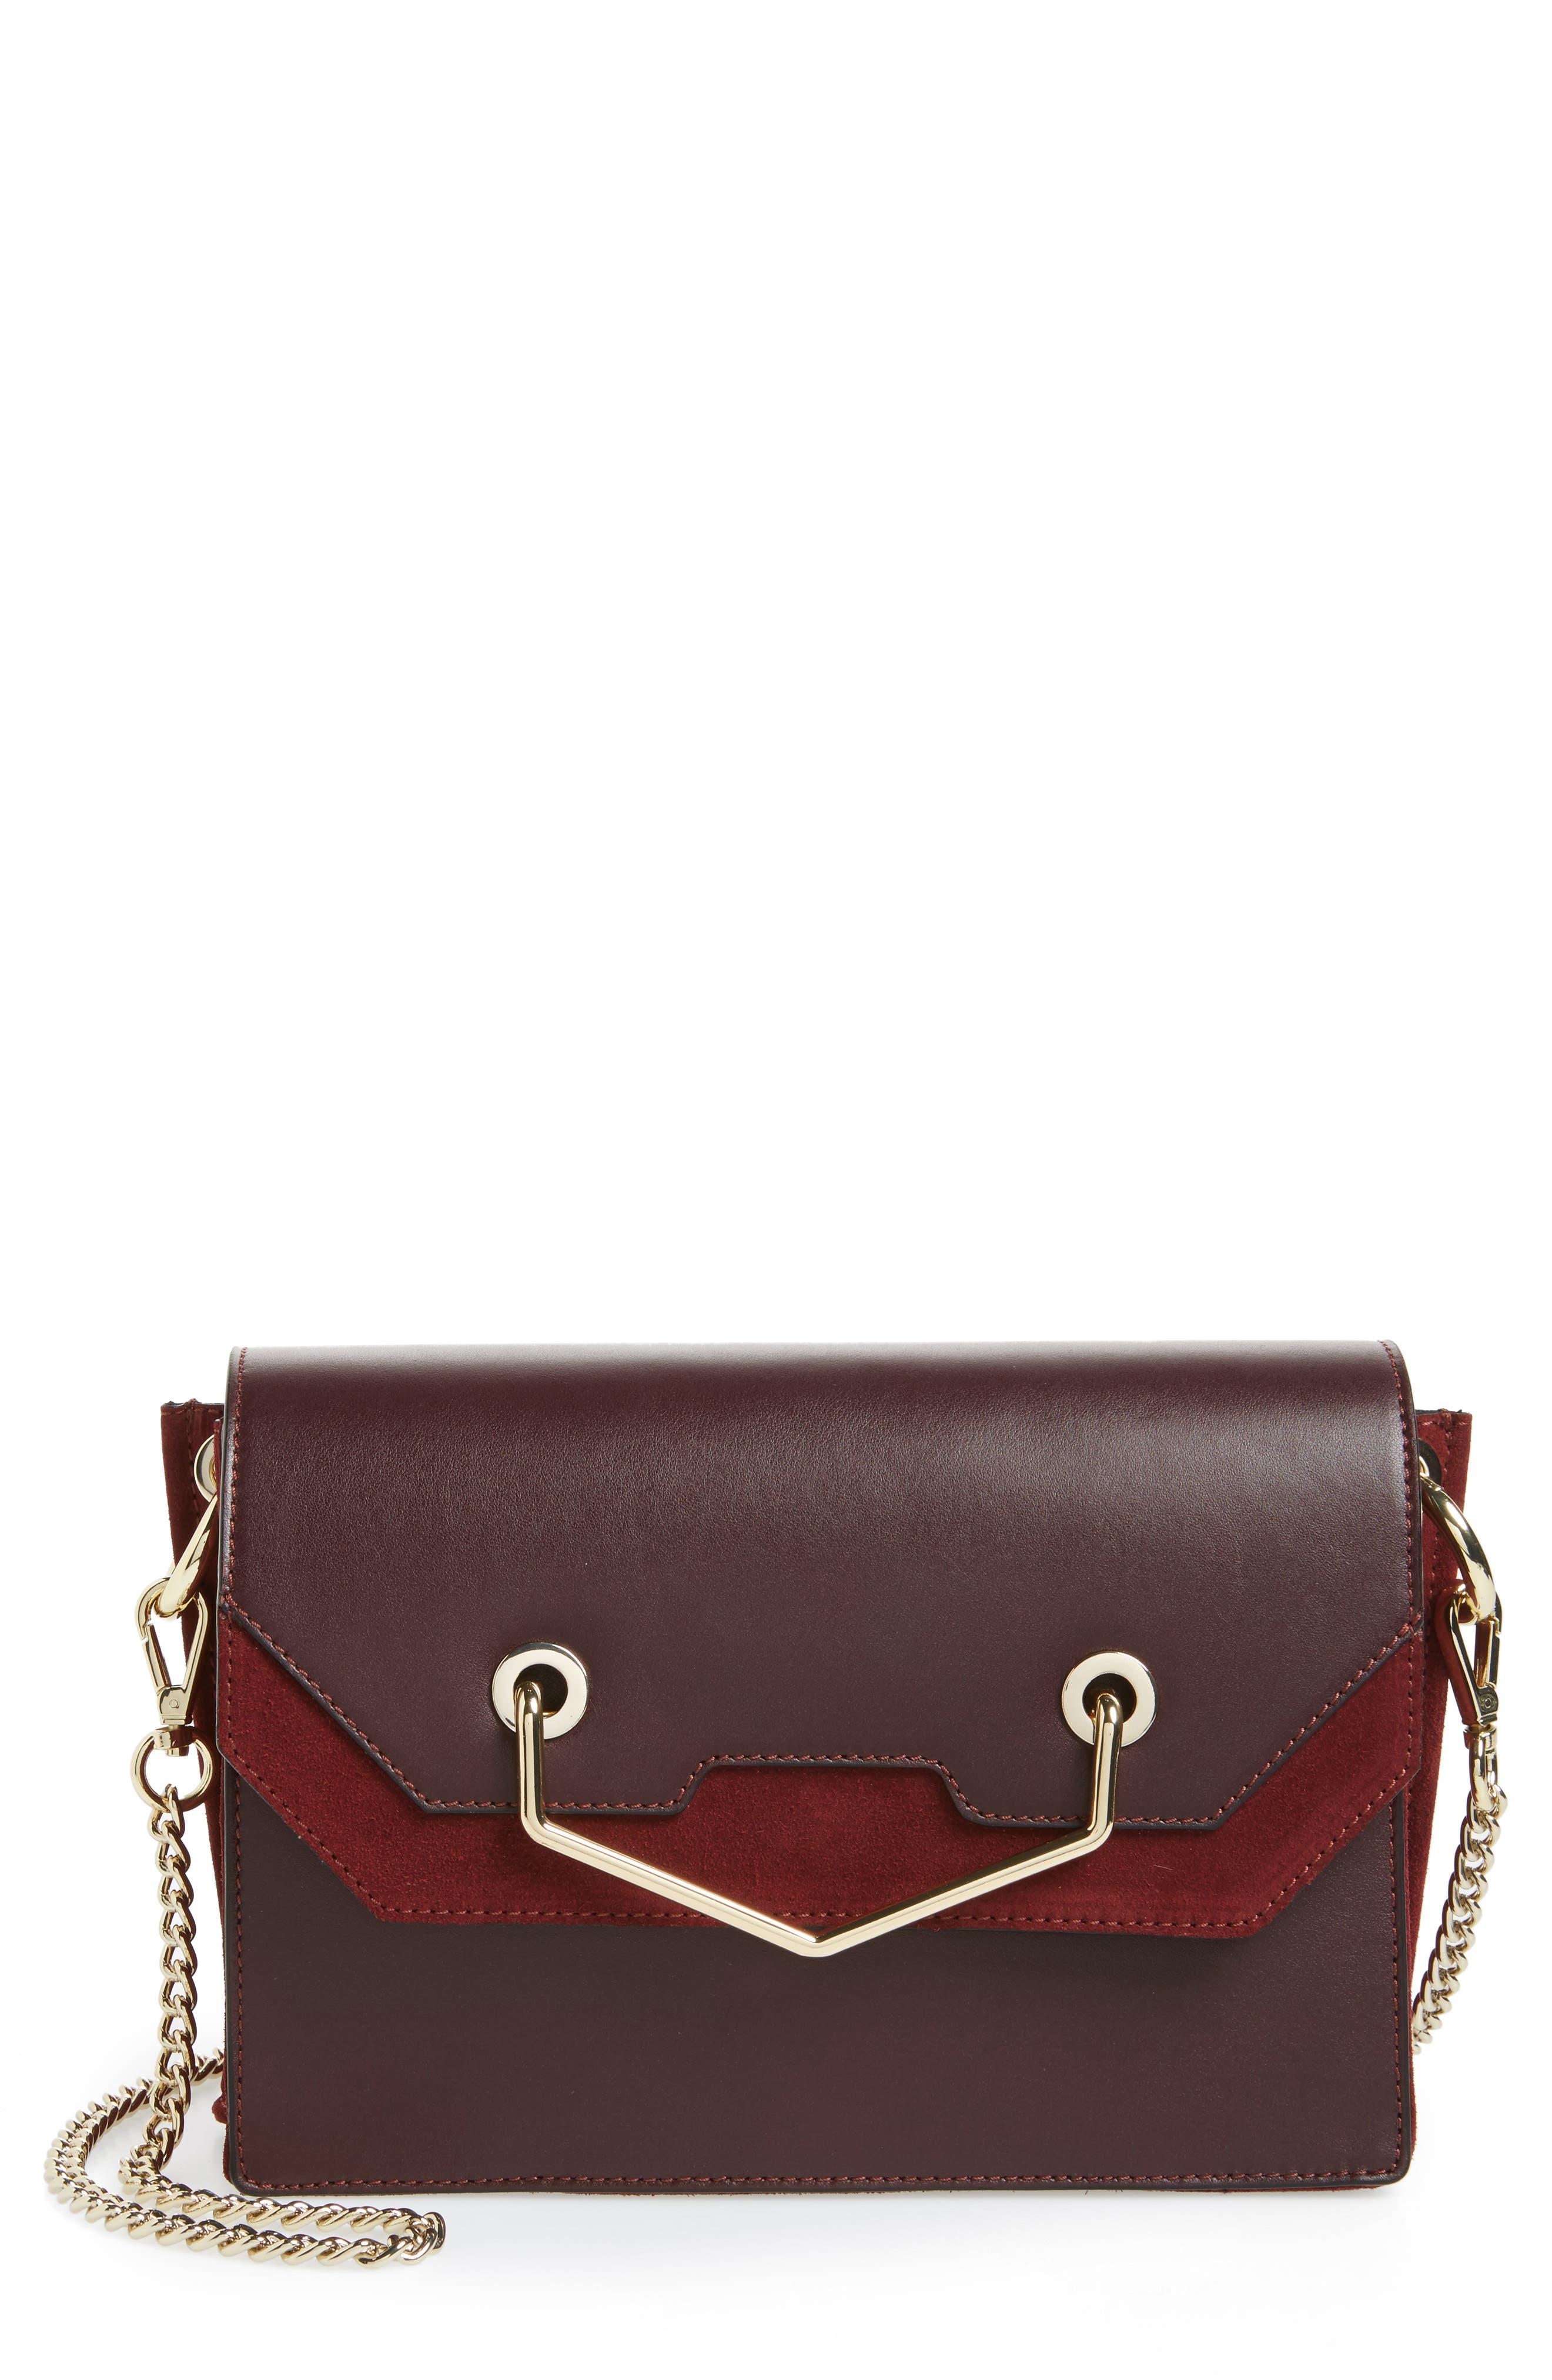 Premium Leather & Suede Soko Shoulder Bag,                         Main,                         color, 930